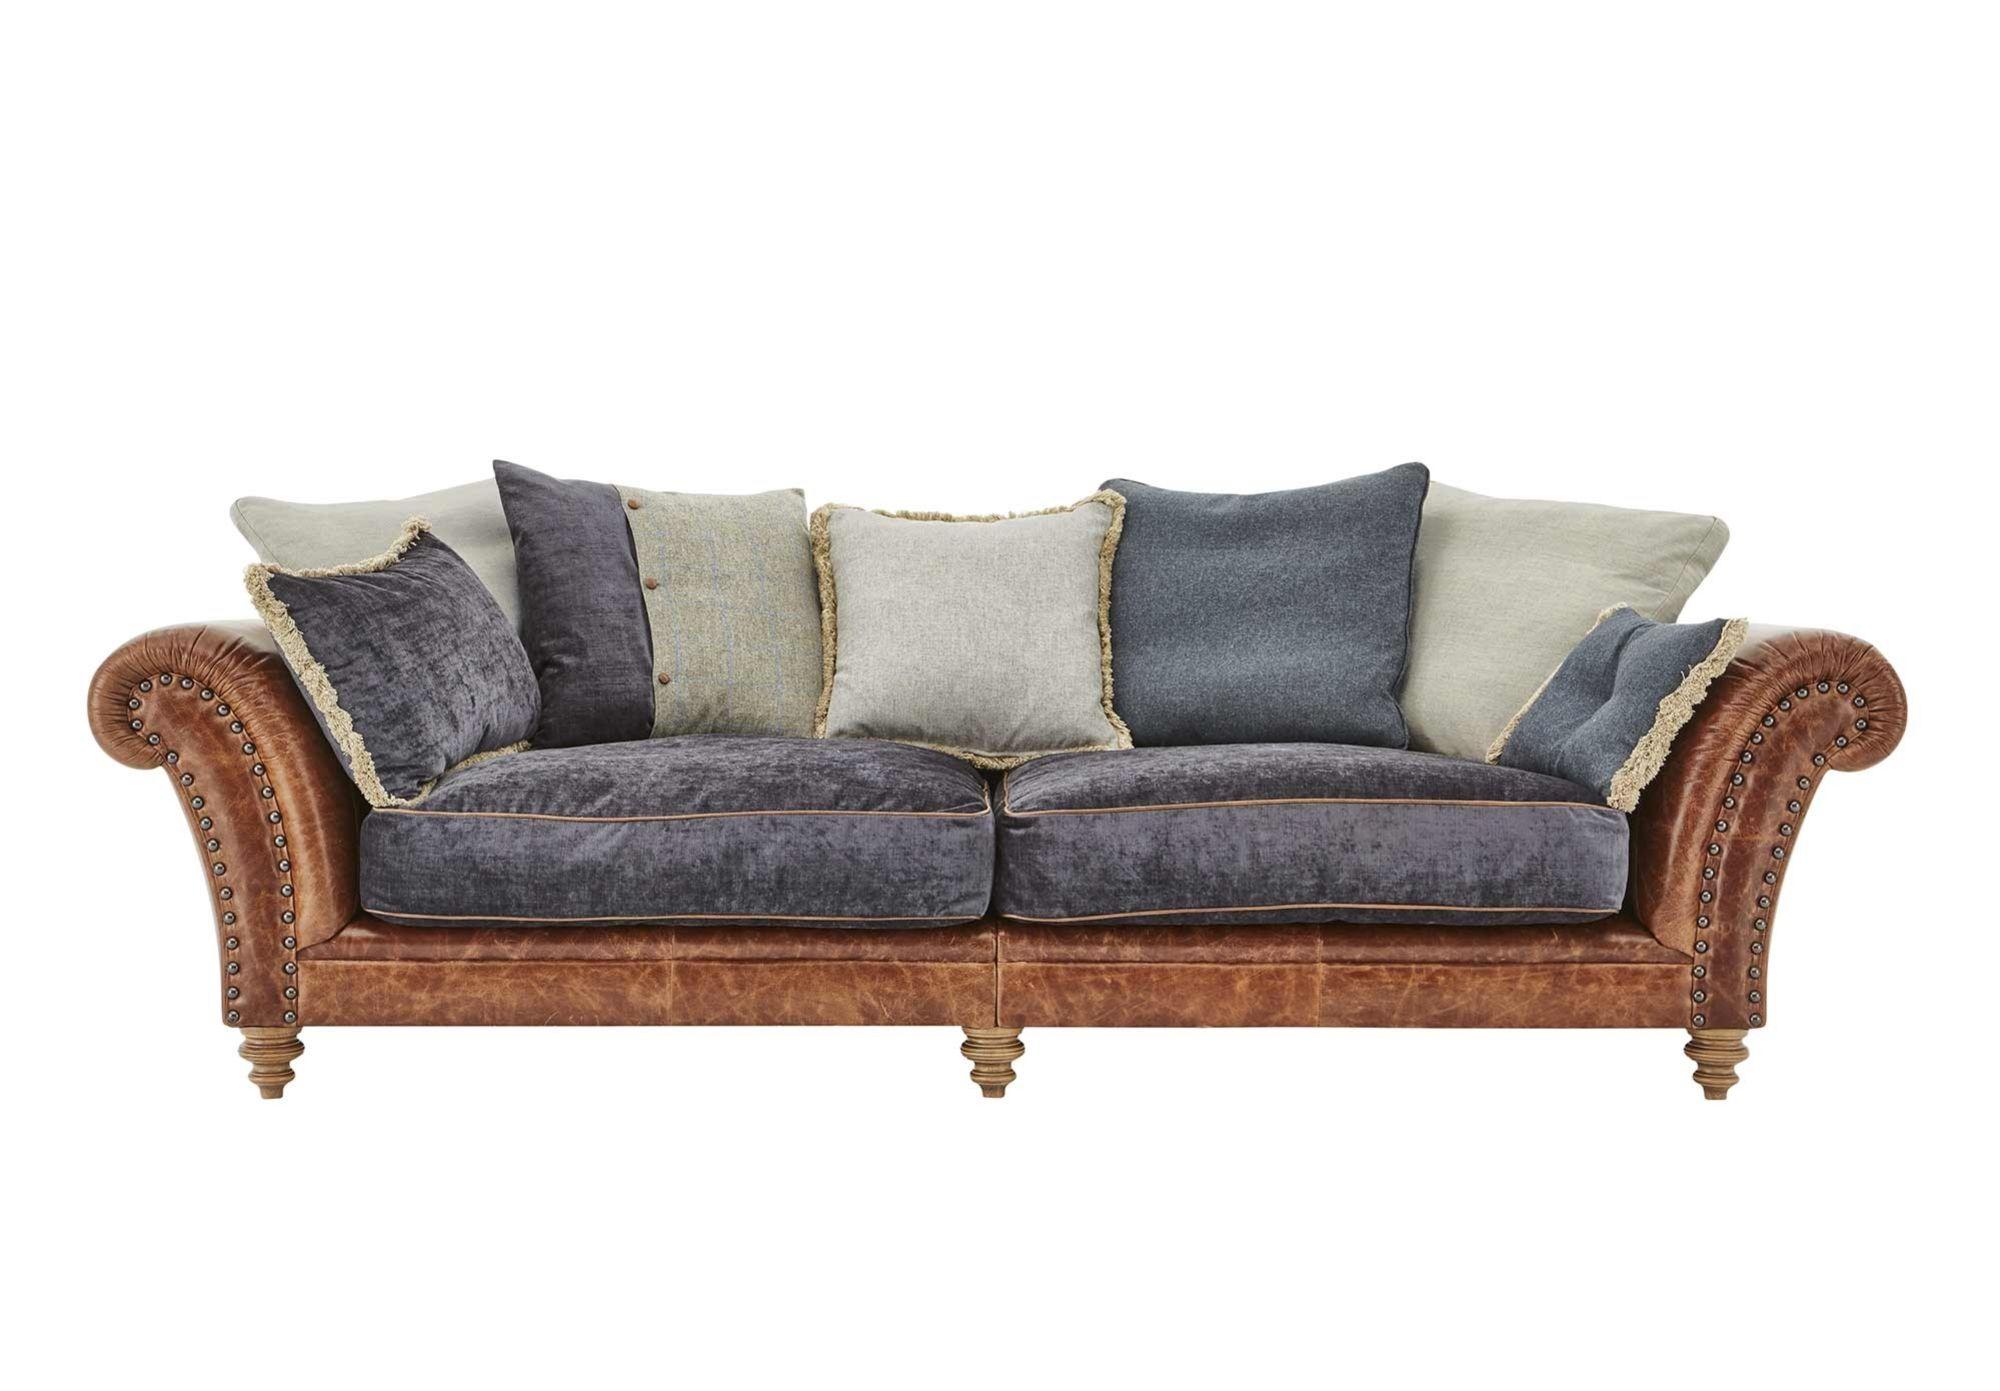 4 Seater Split Frame Leather Sofa Westwood Gorgeous Living